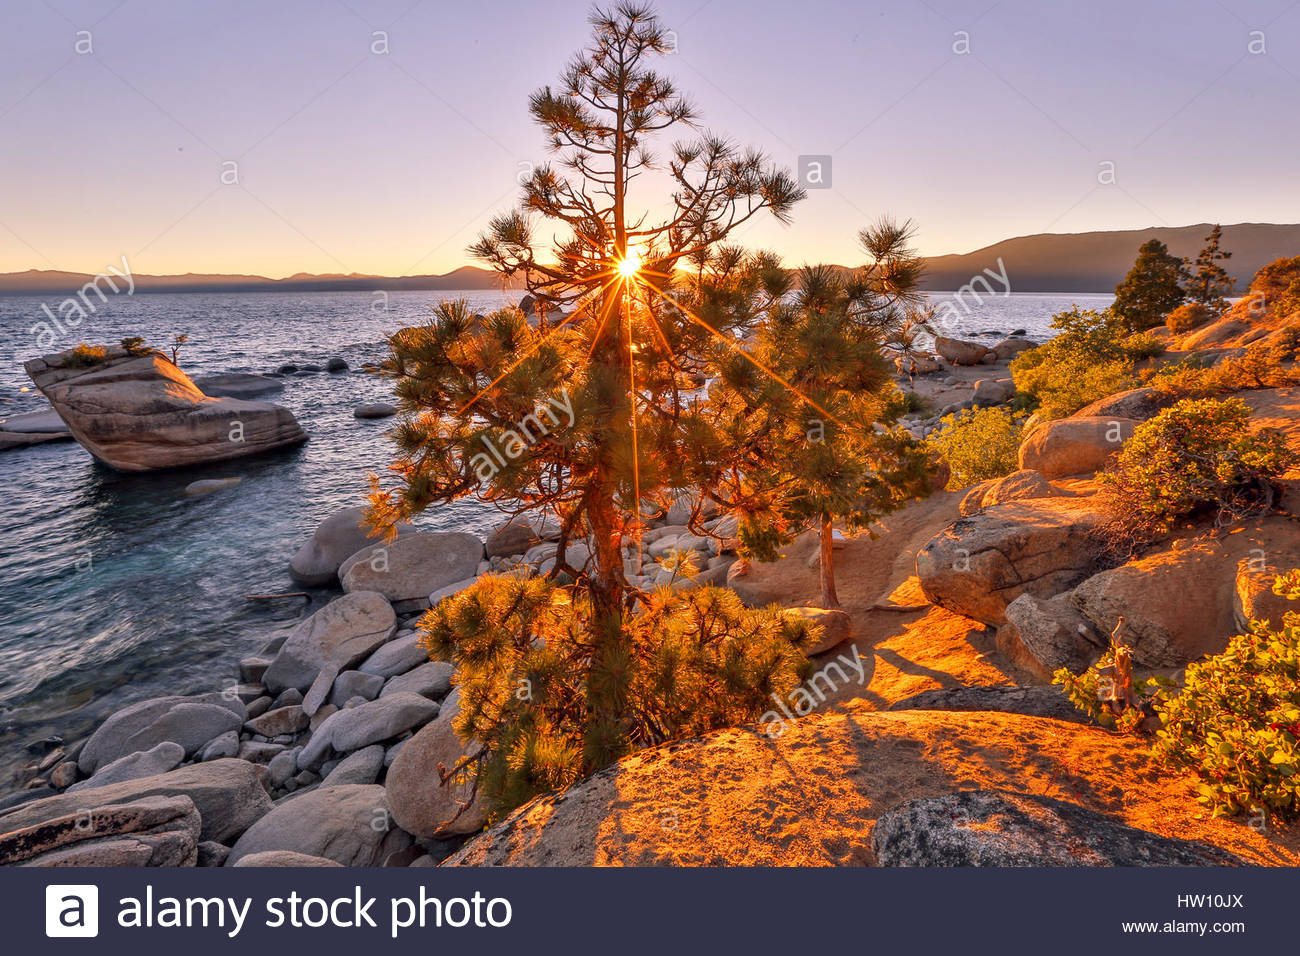 The sun filters through a pine tree near Bonzai Rock in Lake Tahoe. - Stock Image